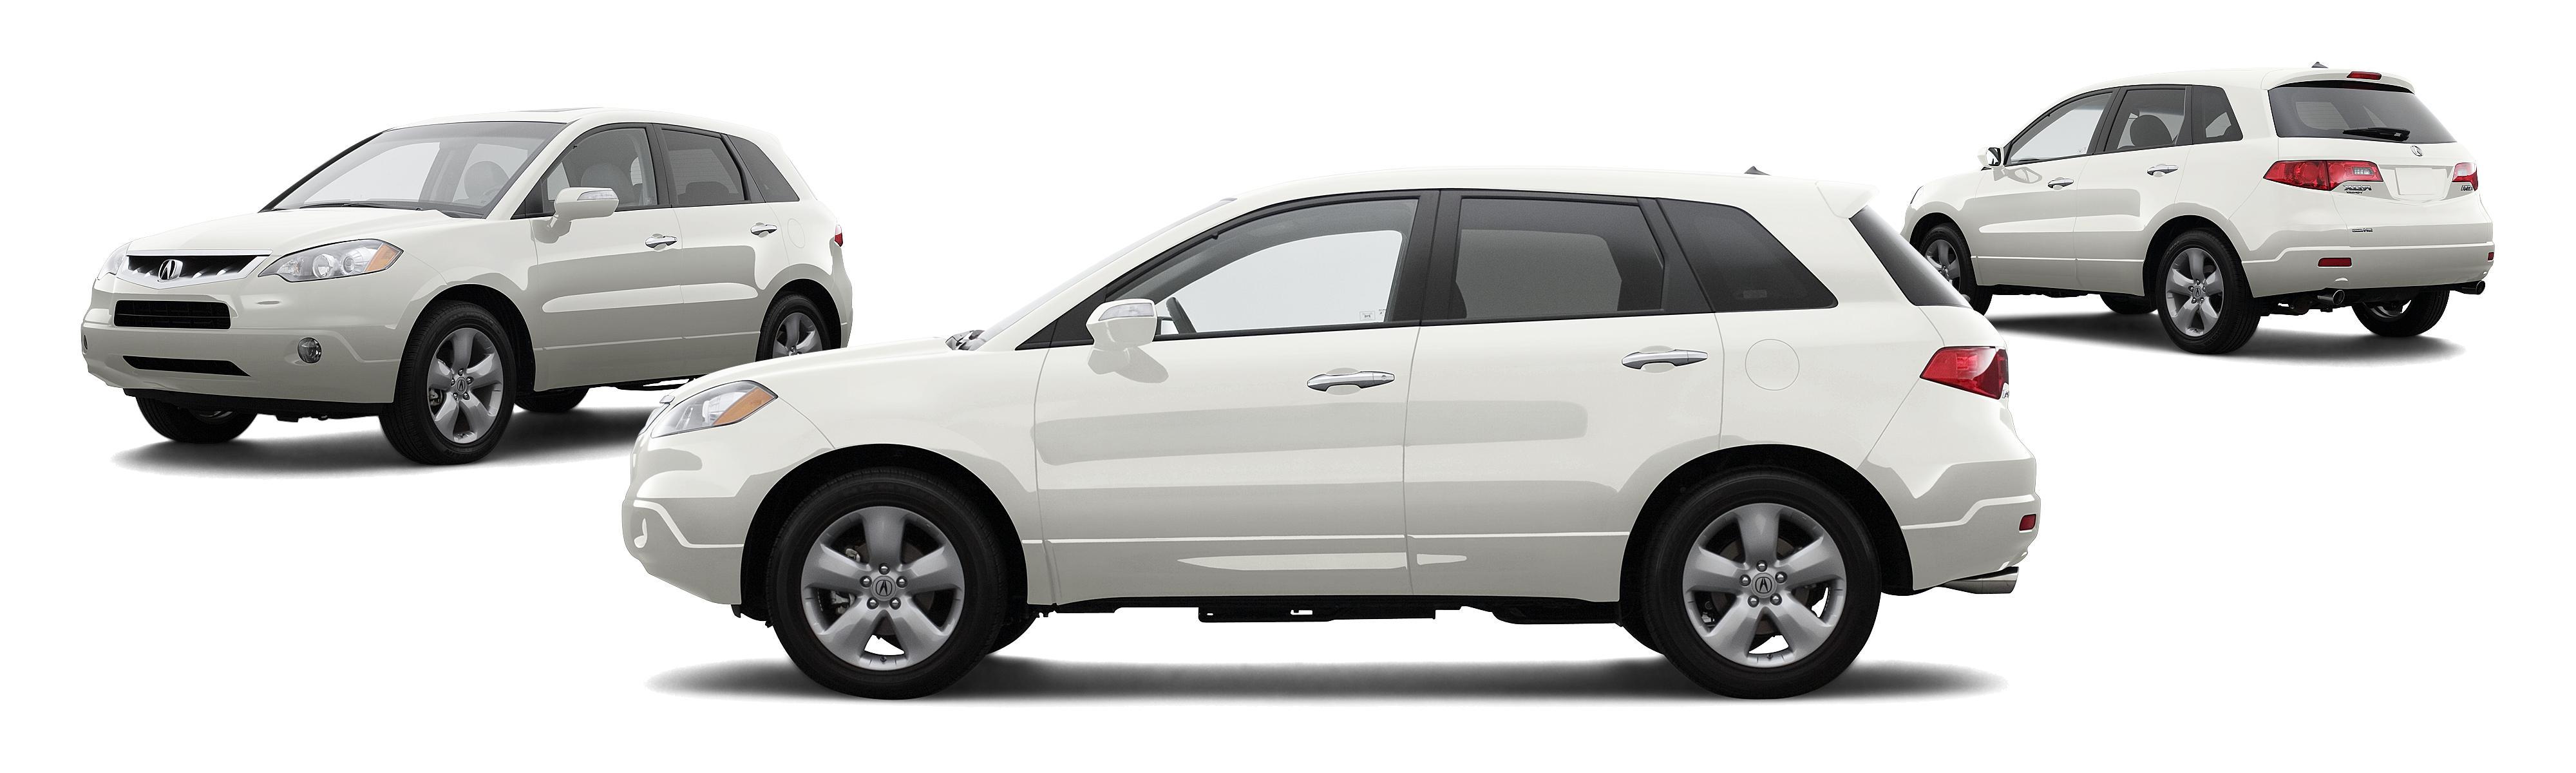 mdx york inventory car leasing brooklyn acura new sale staten dealer acuramdx island for sam rdx